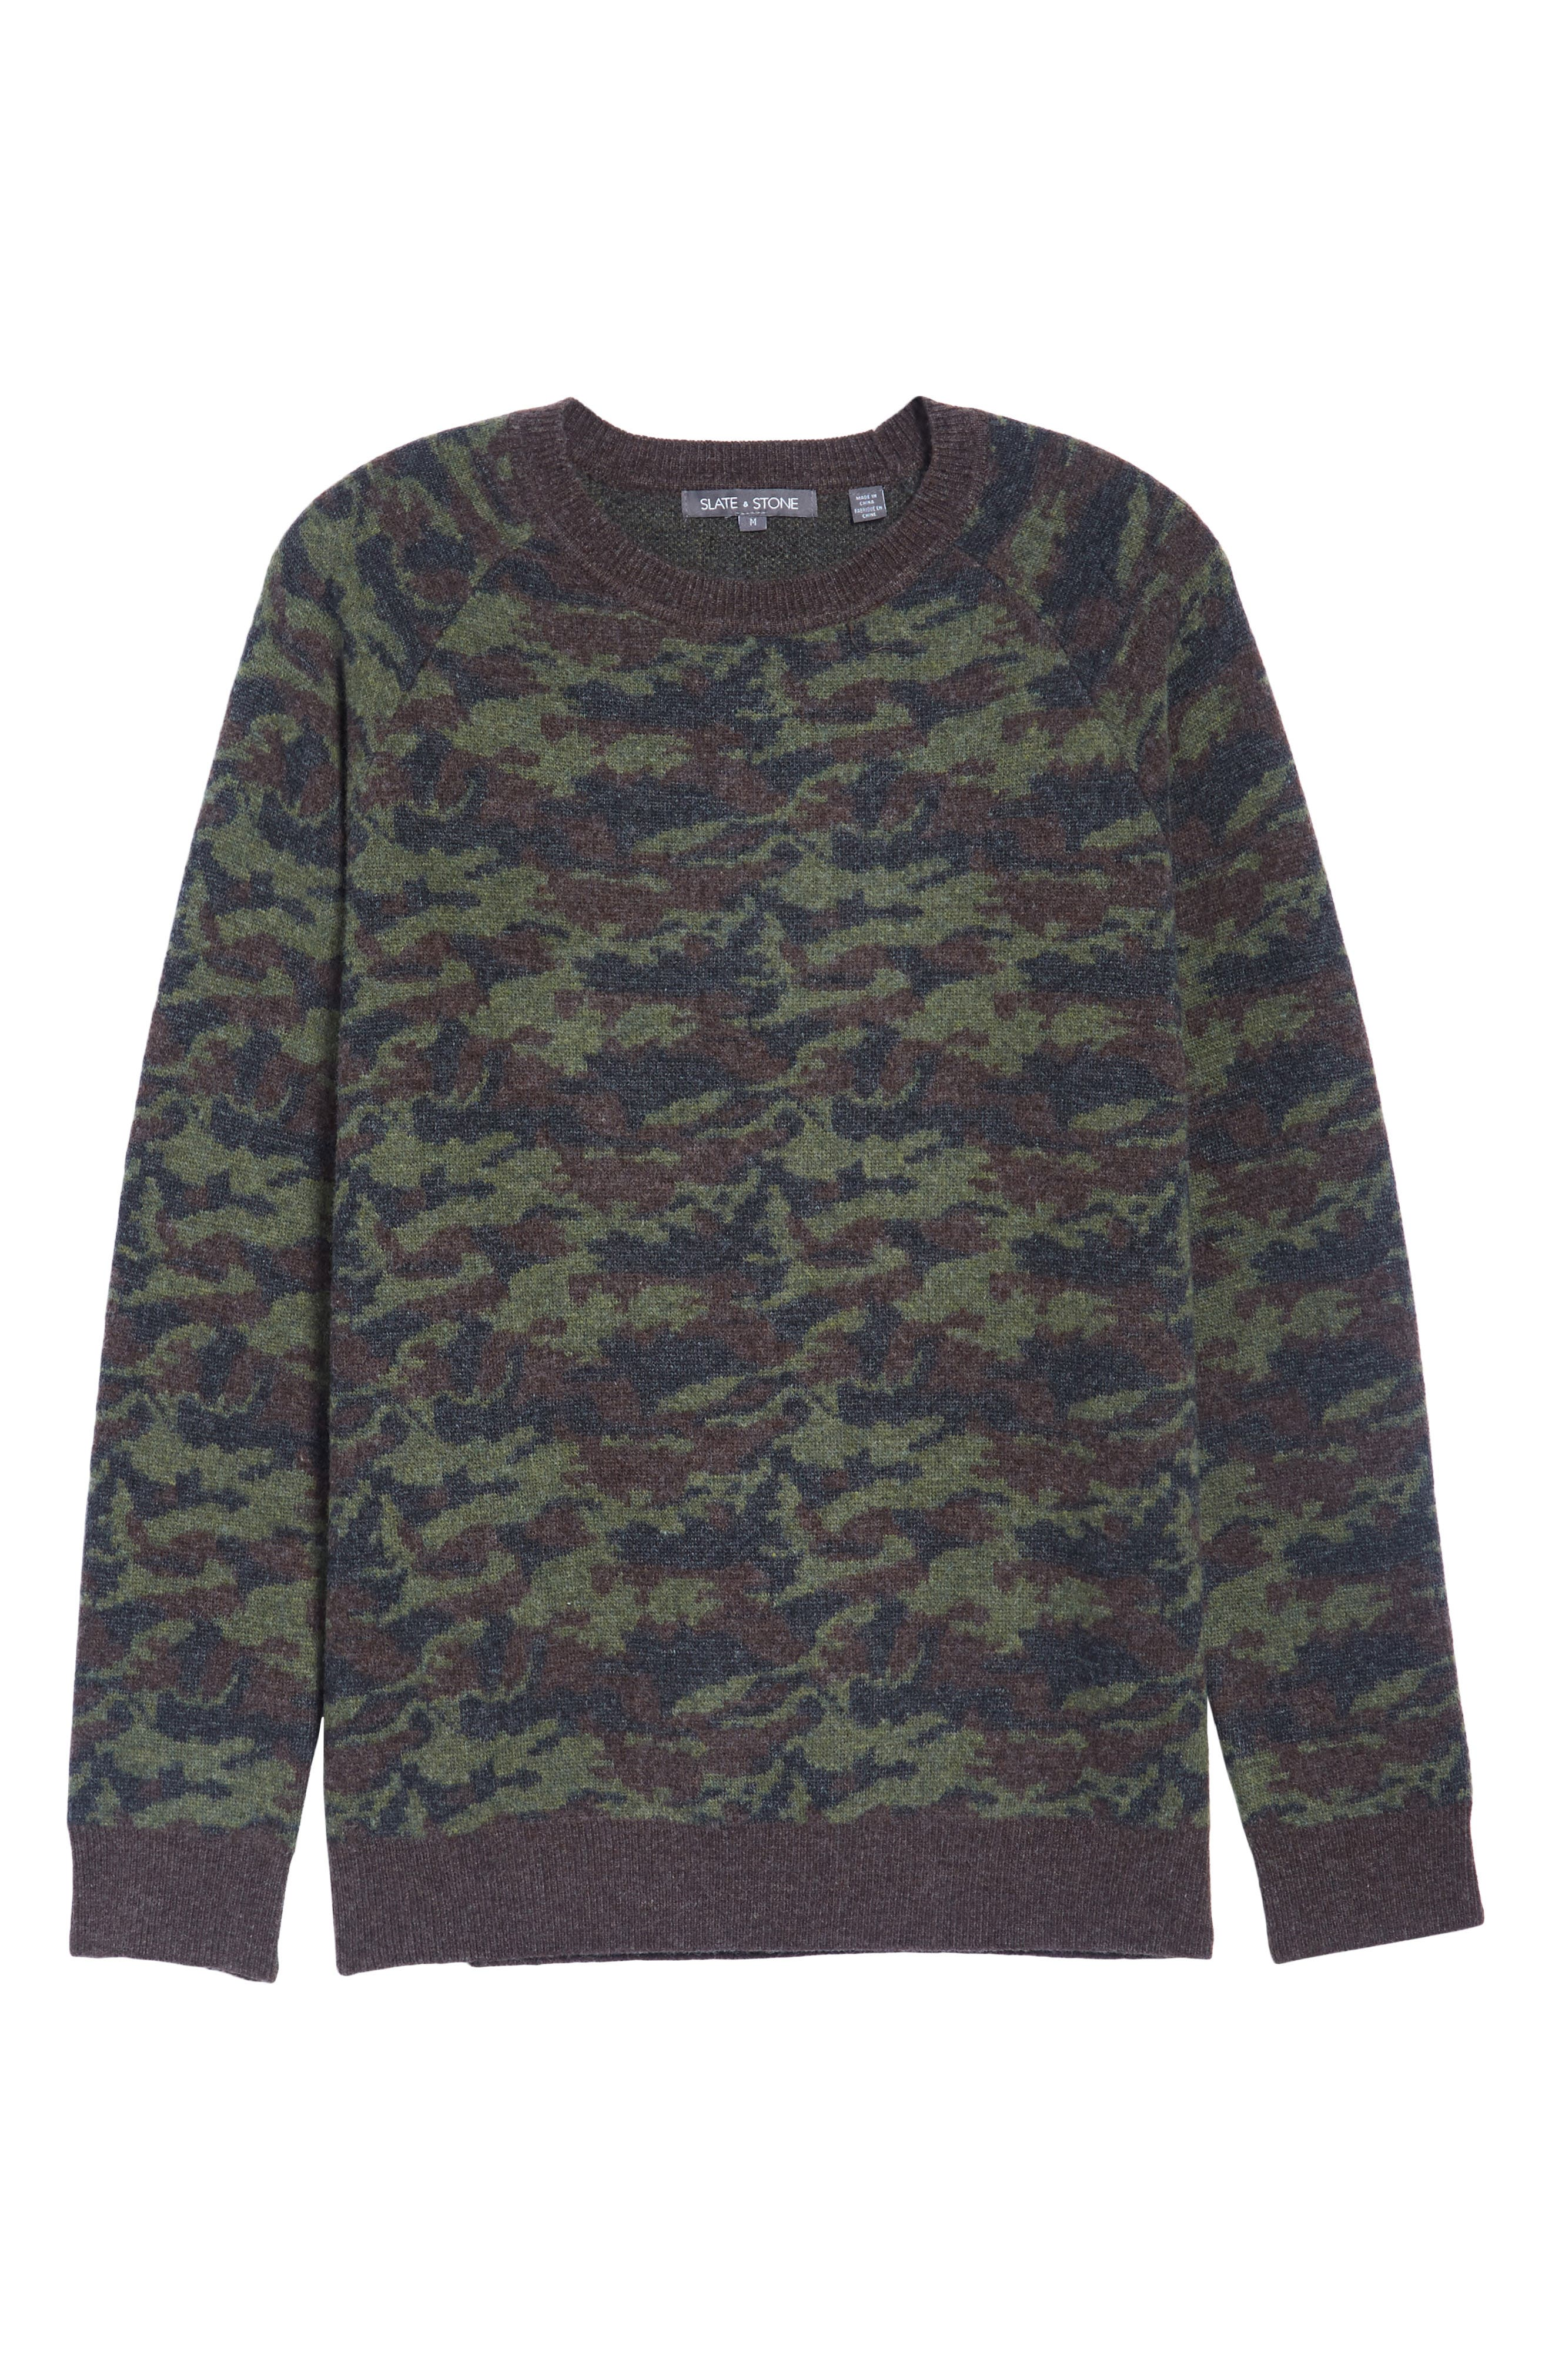 Wool Camo Sweater,                             Alternate thumbnail 6, color,                             Green Camo